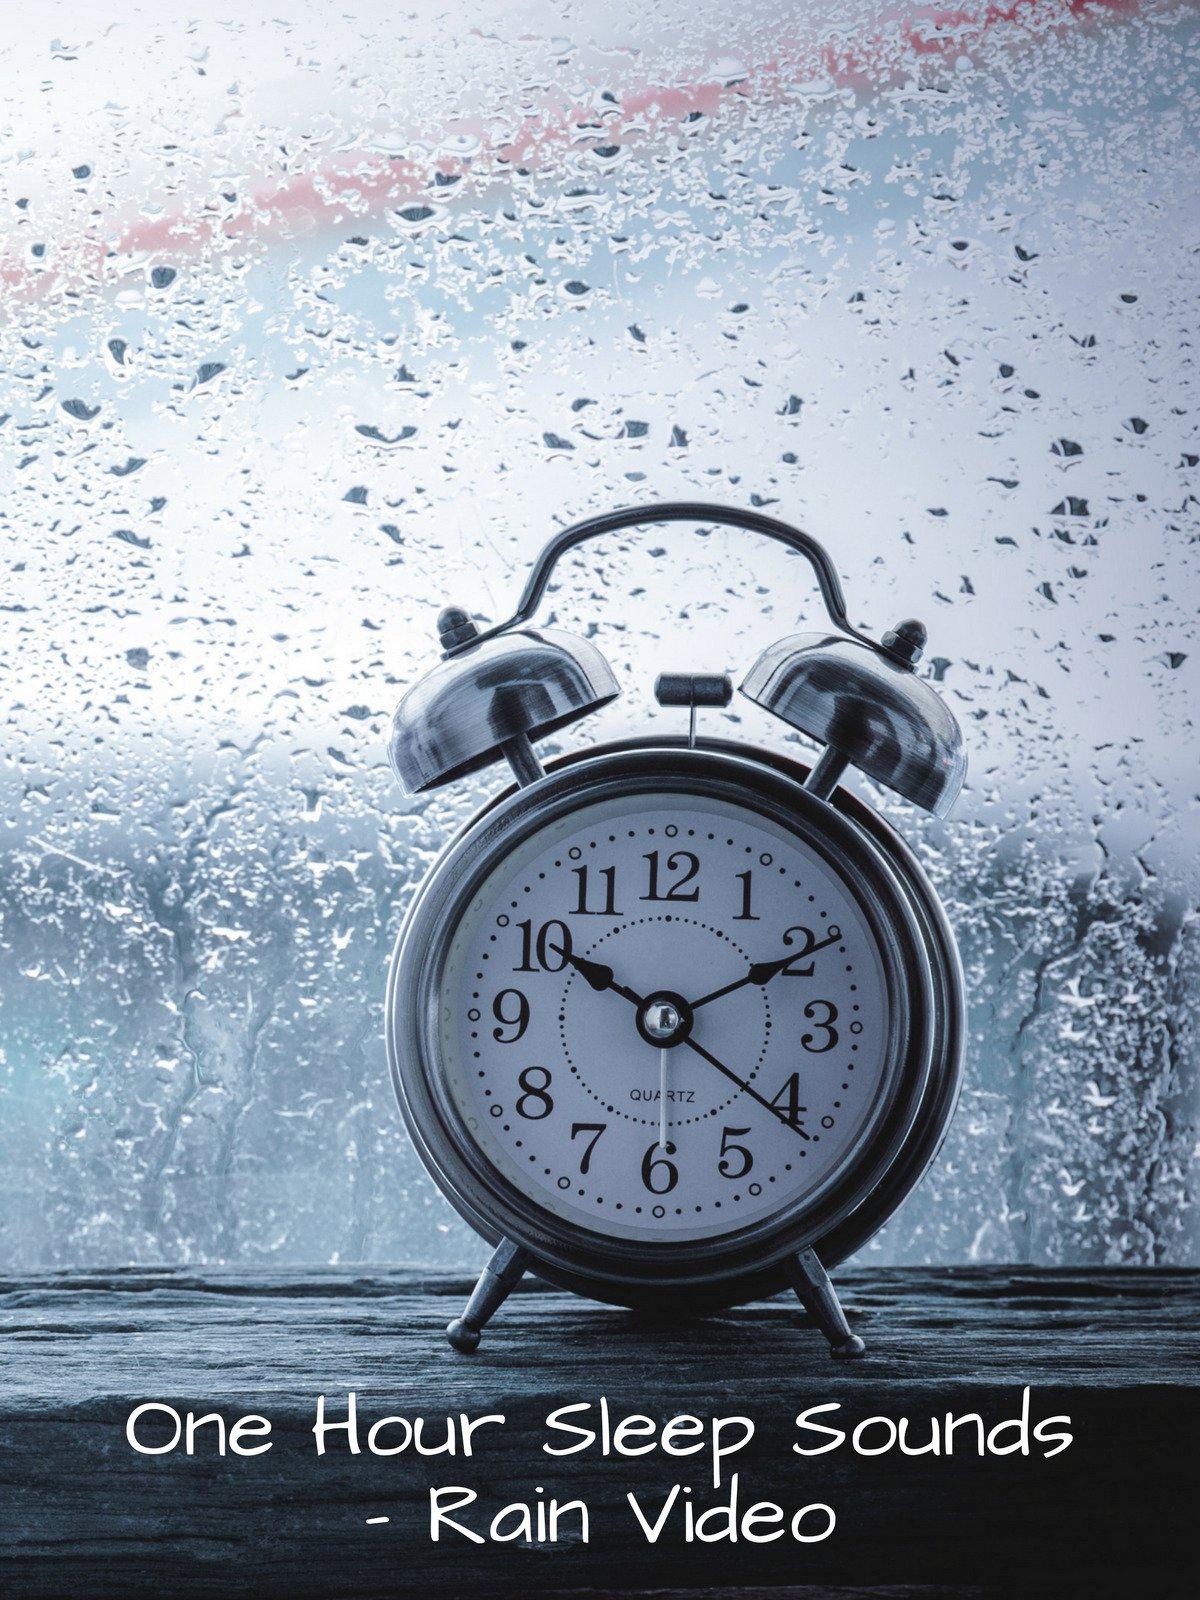 One hour sleep sounds